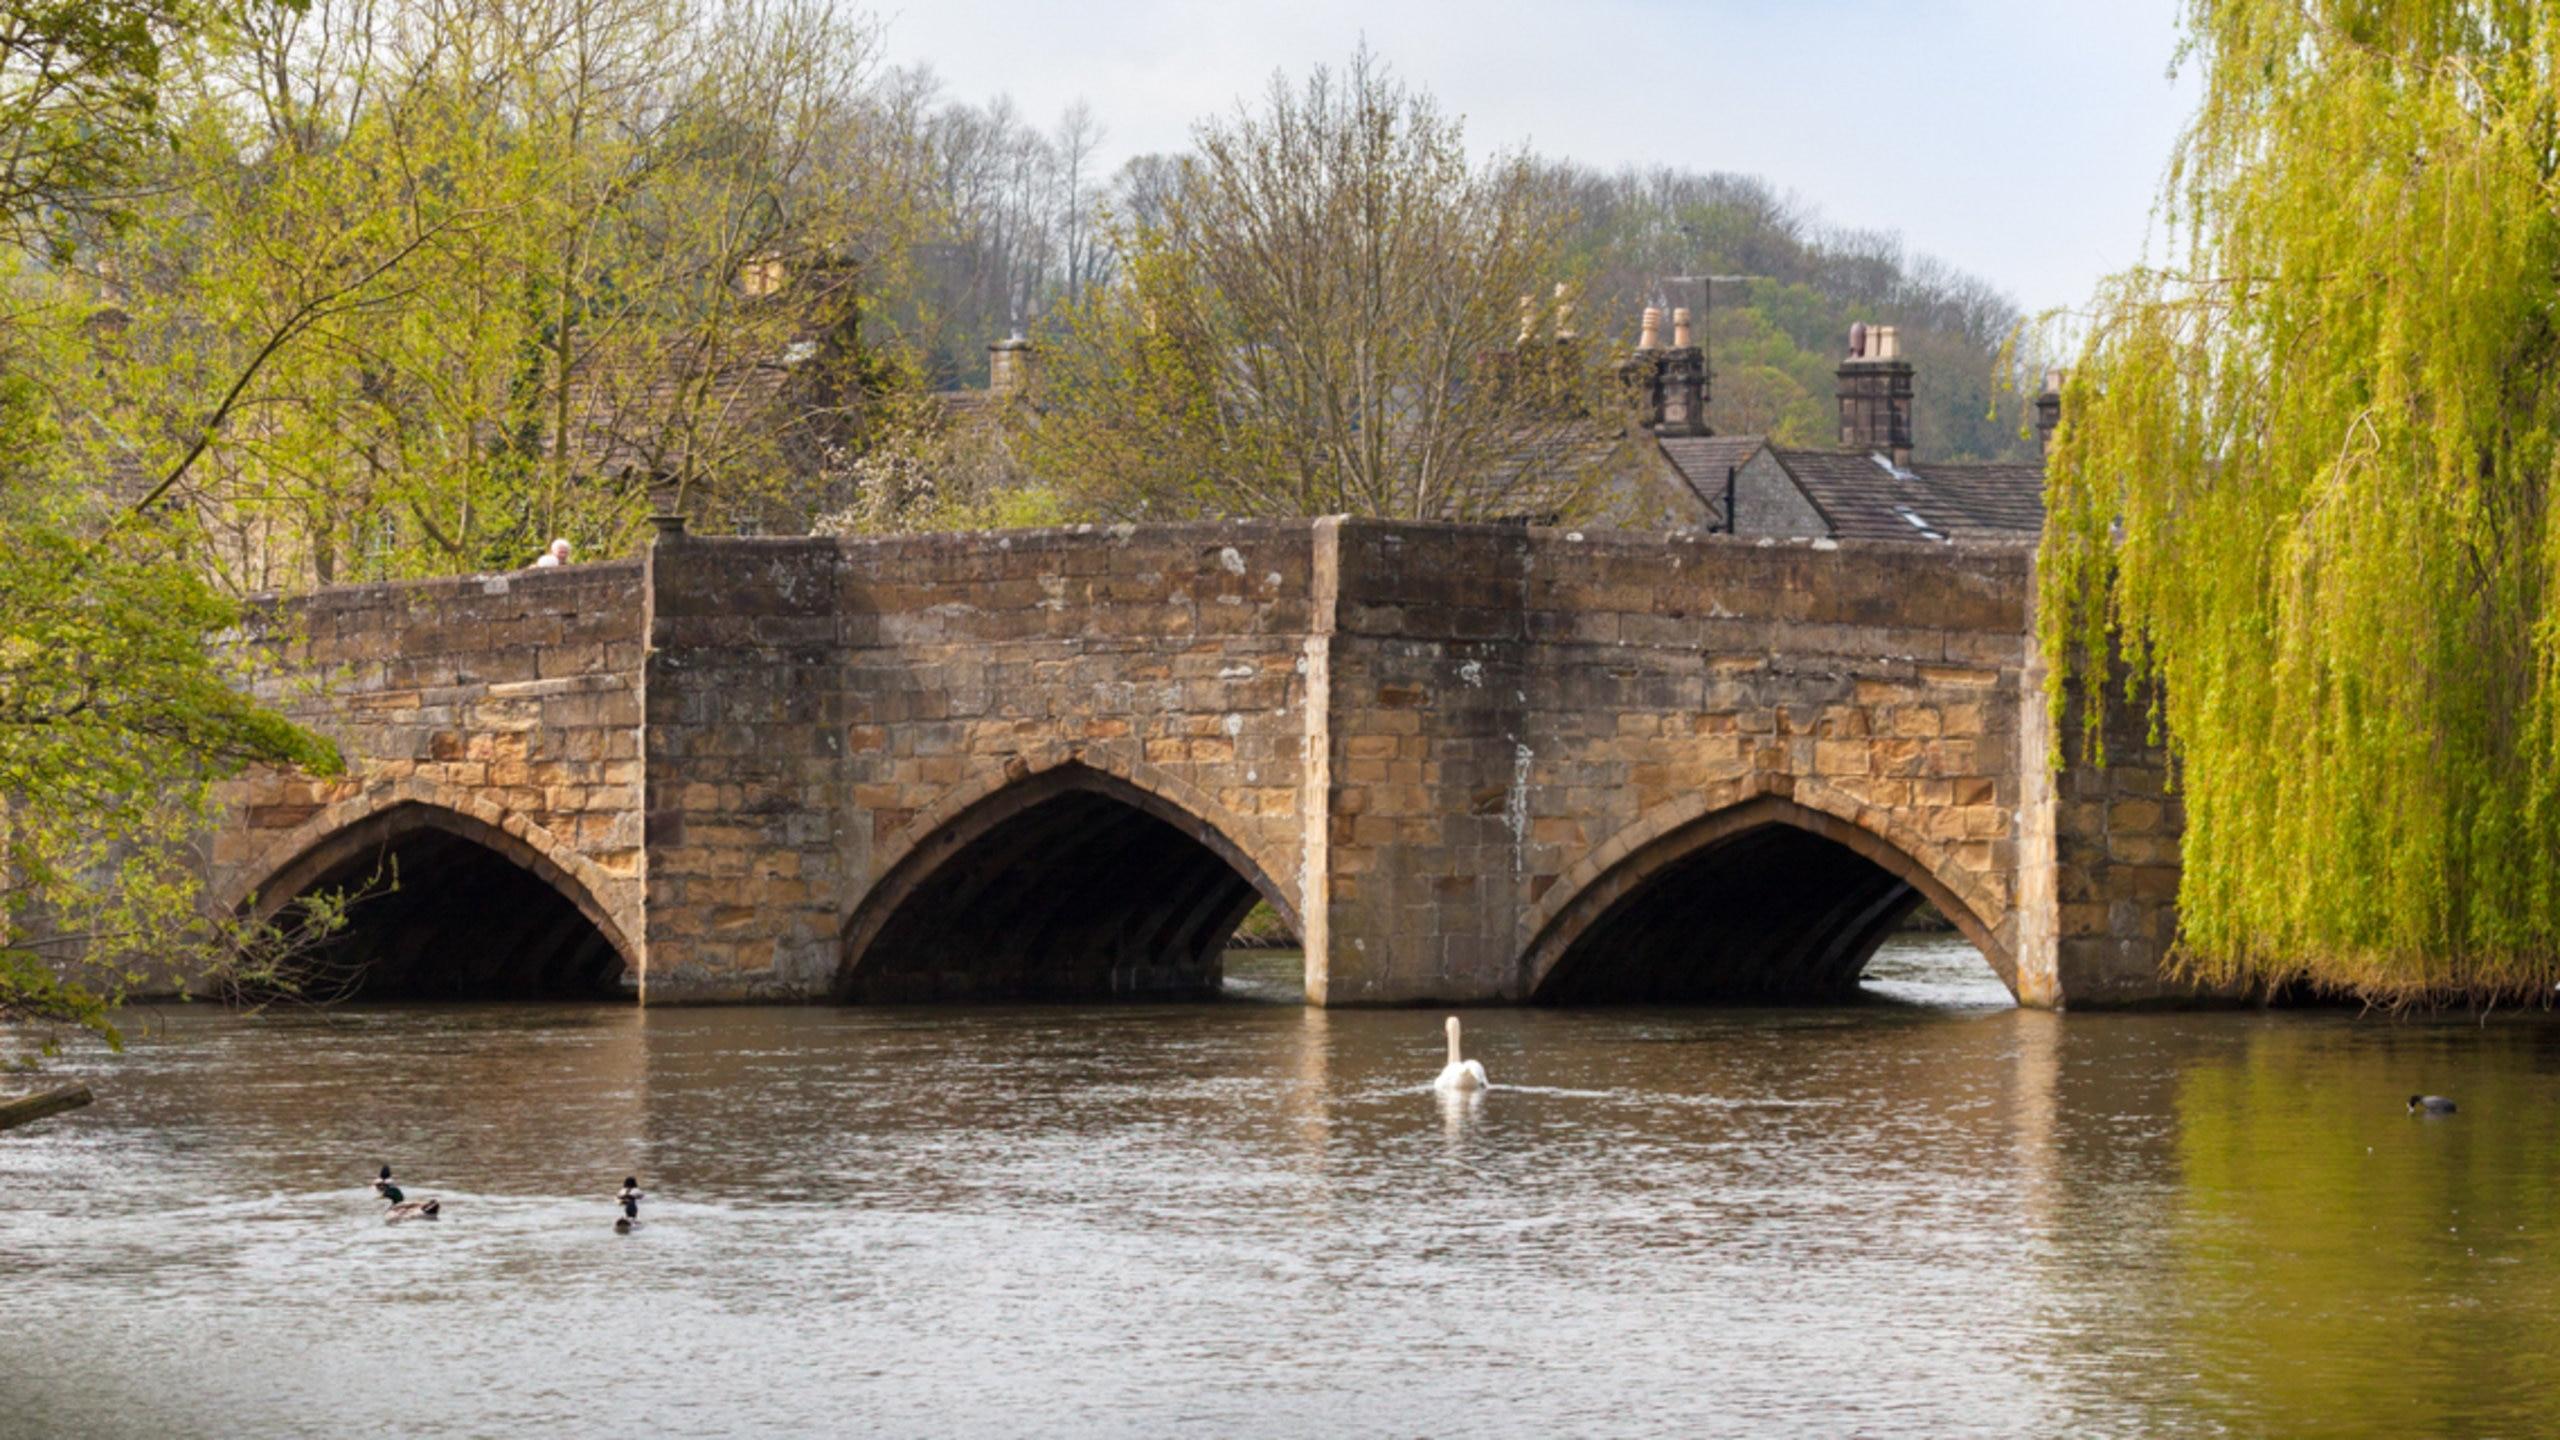 Derbyshire Dales District, England, United Kingdom